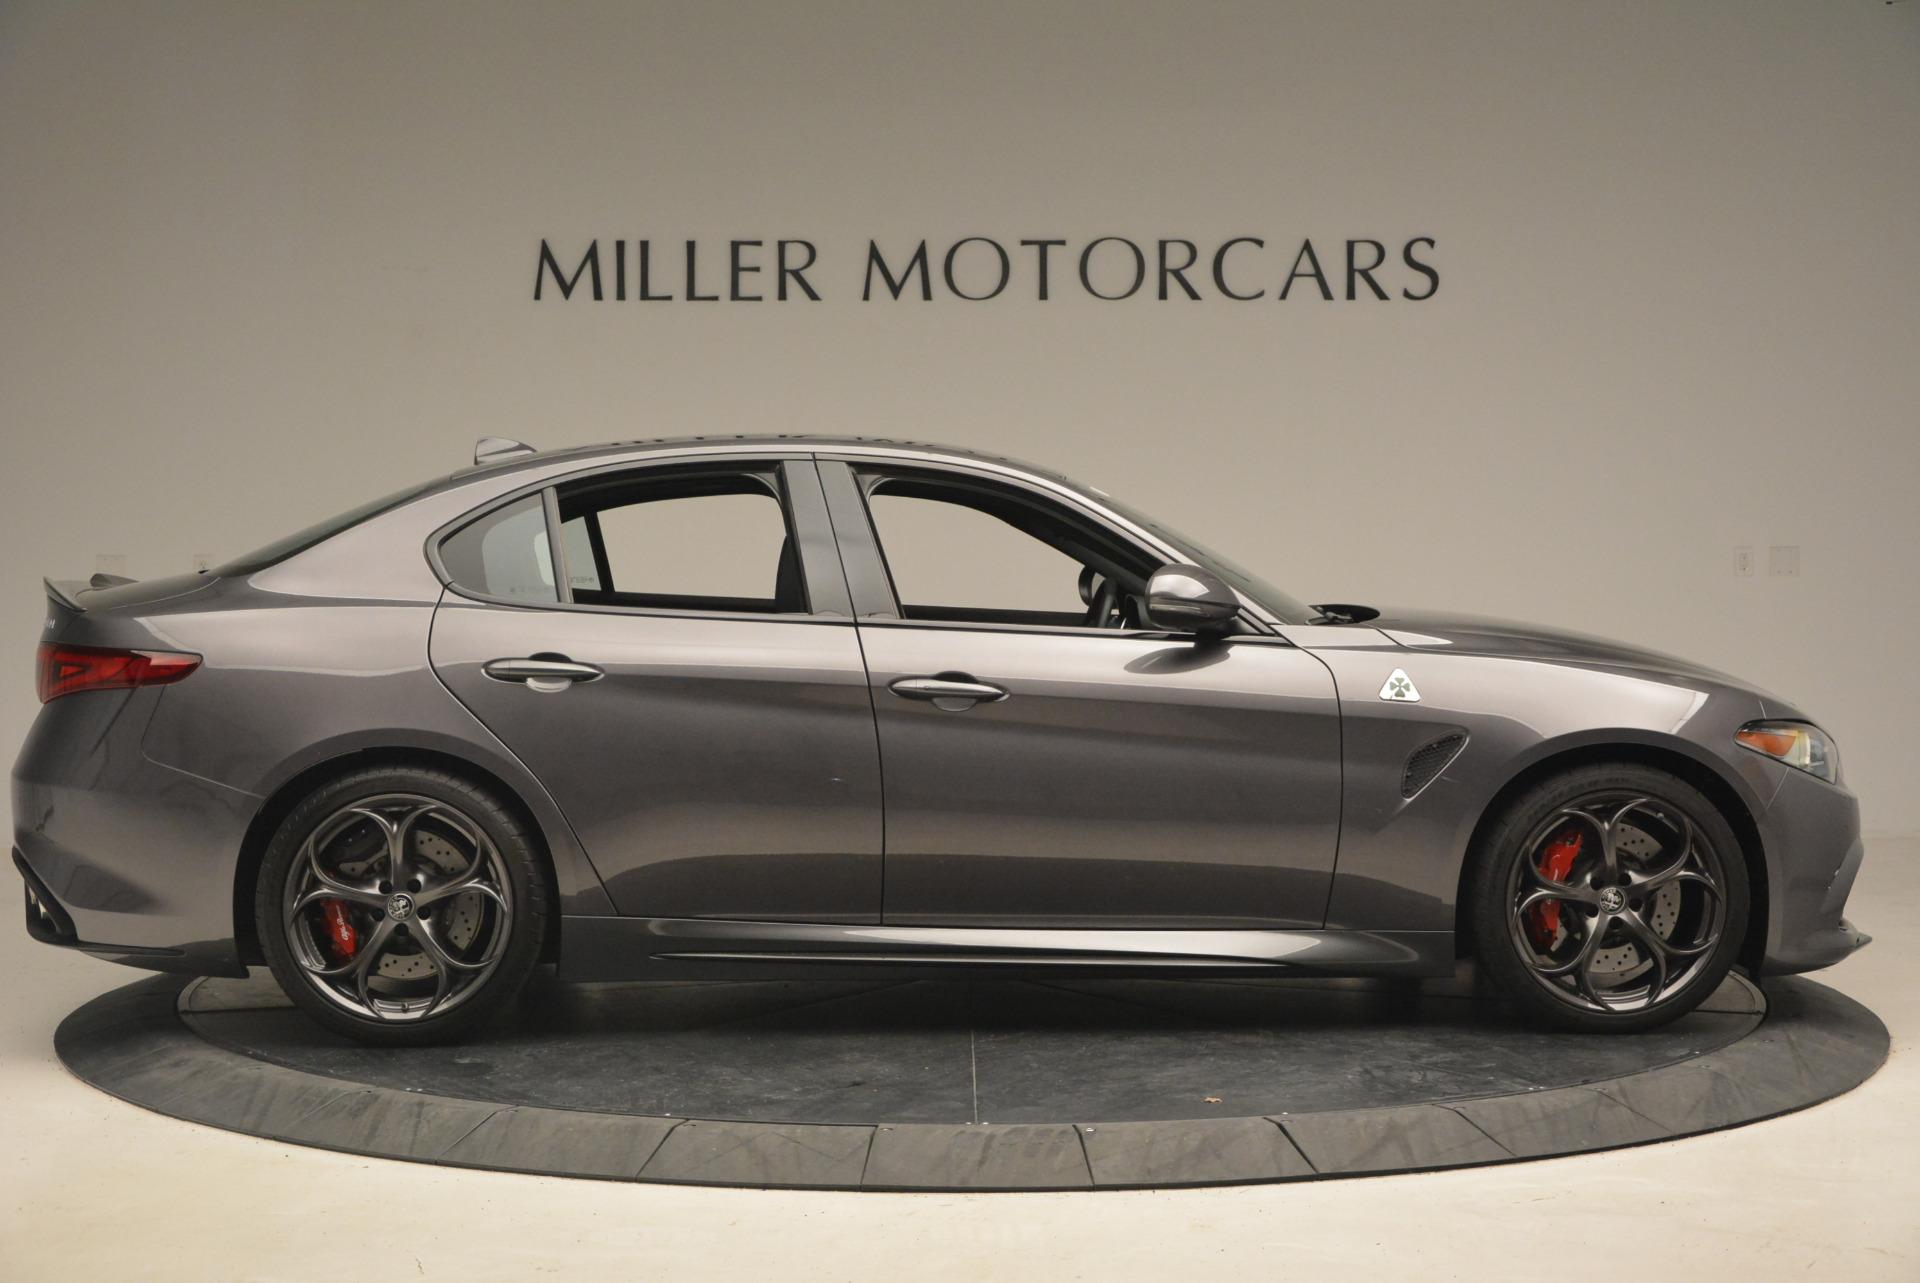 New-2017-Alfa-Romeo-Giulia-Quadrifoglio